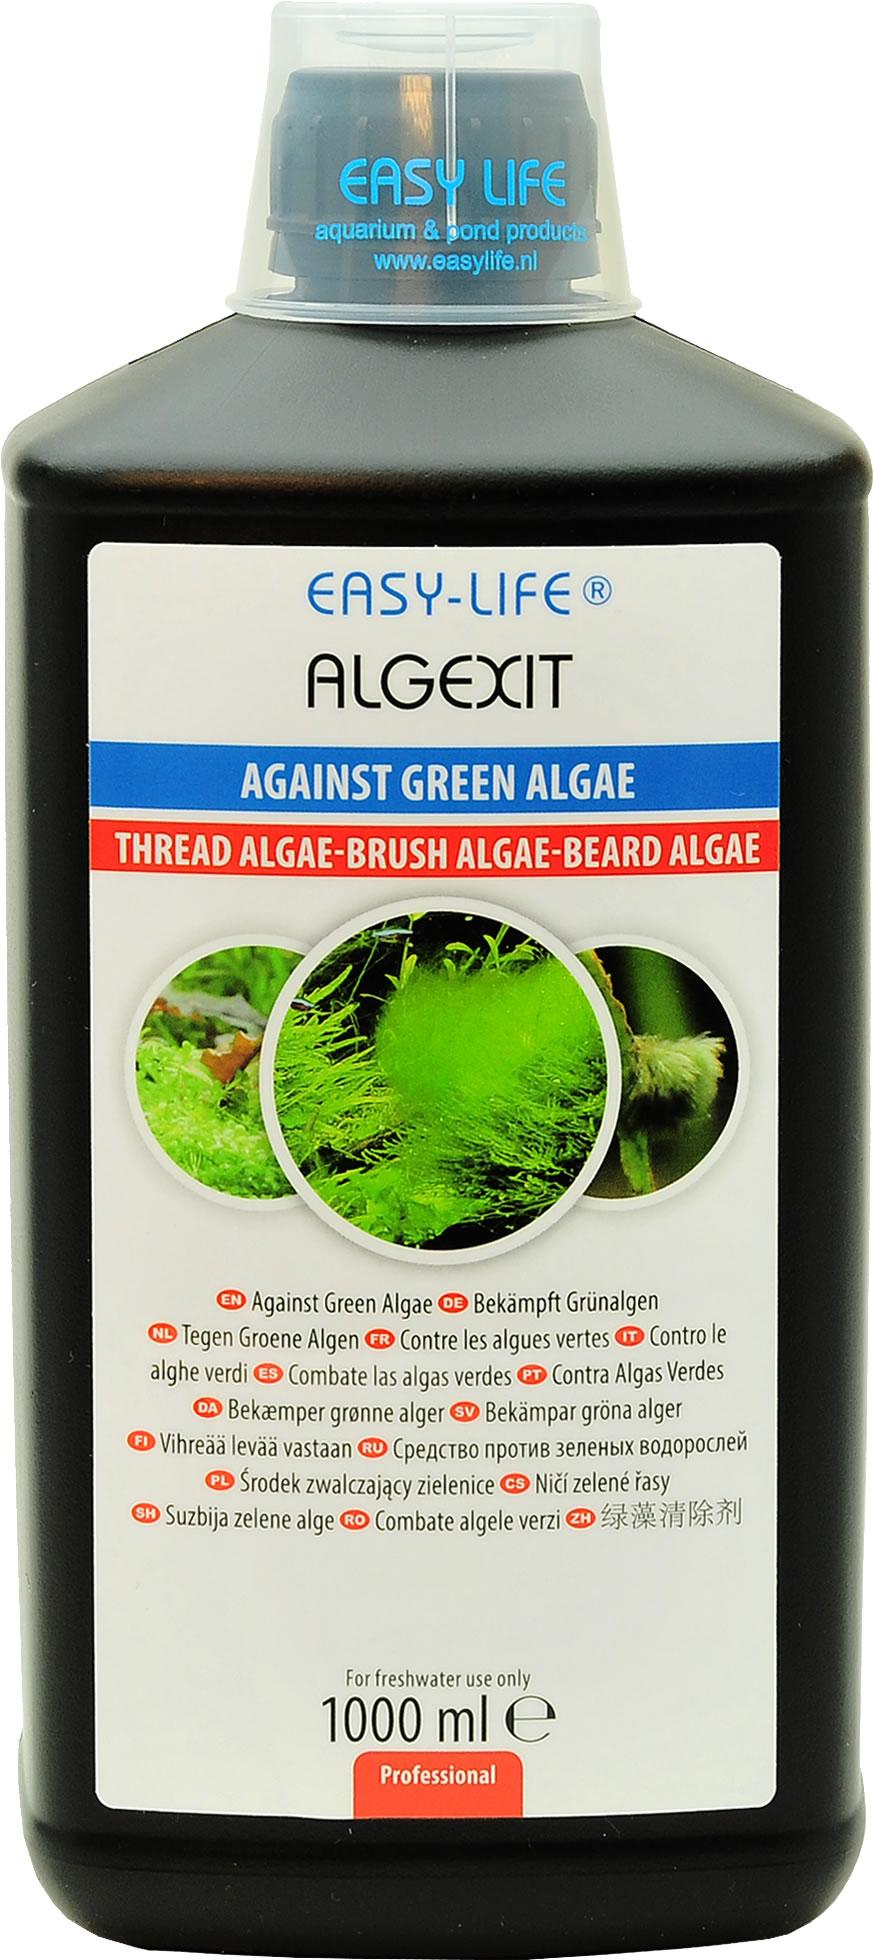 Easy Life AlgExit 1.000 ml - broschei